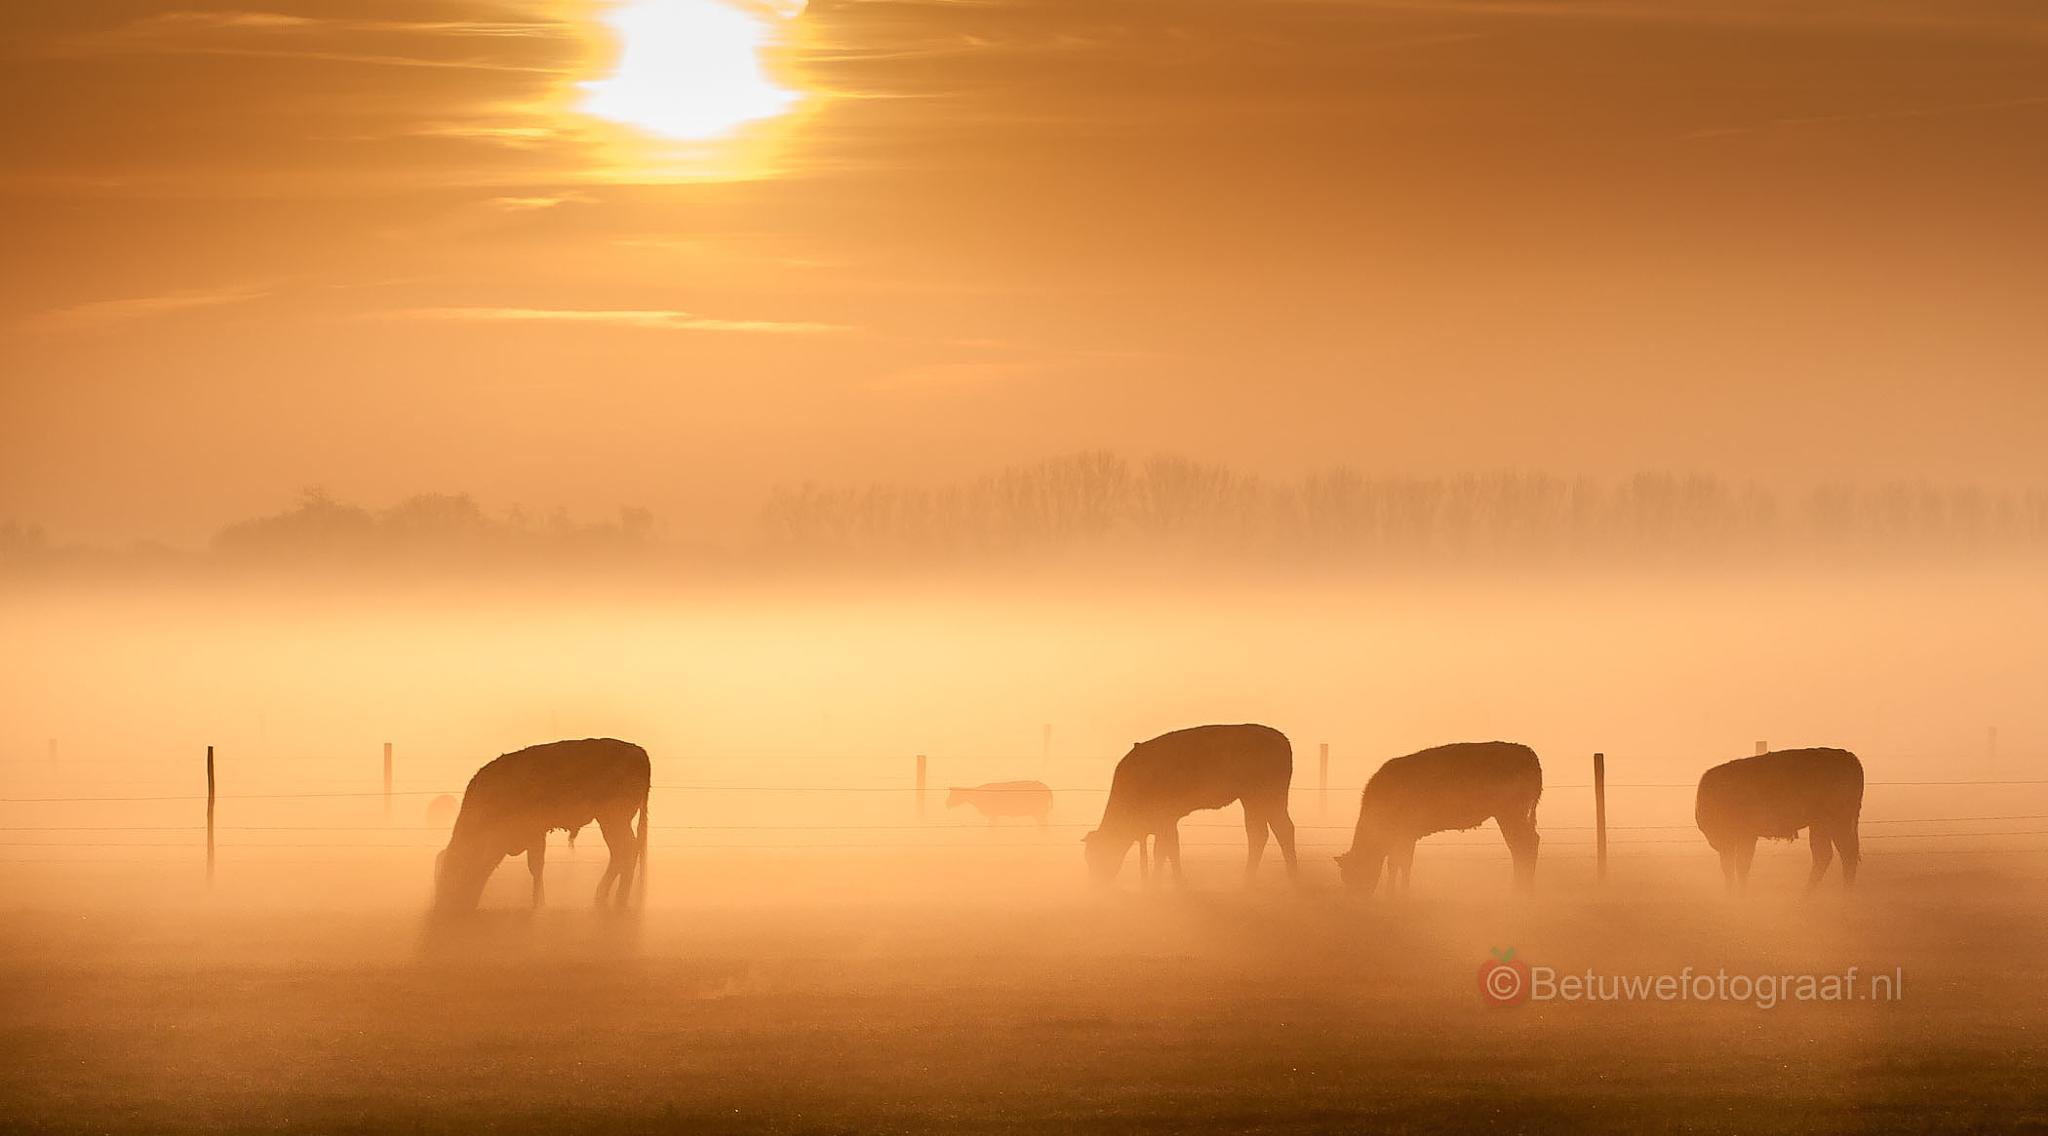 Cows in the morning mist by Betuwefotograaf